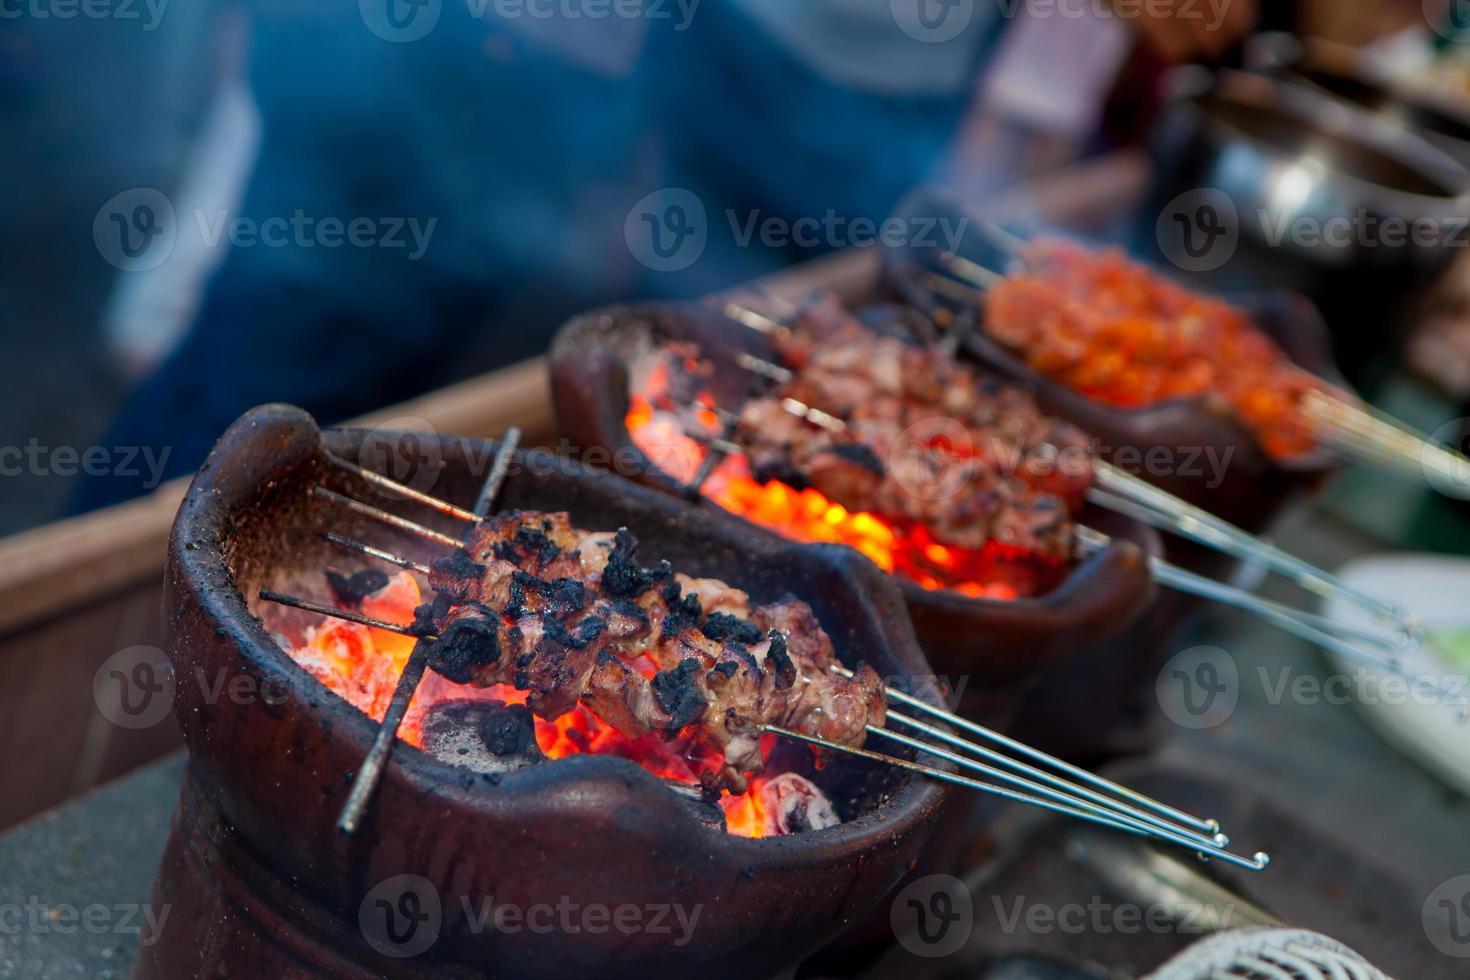 cibo indonesiano satay jogja klatak carne essendo griglia foto